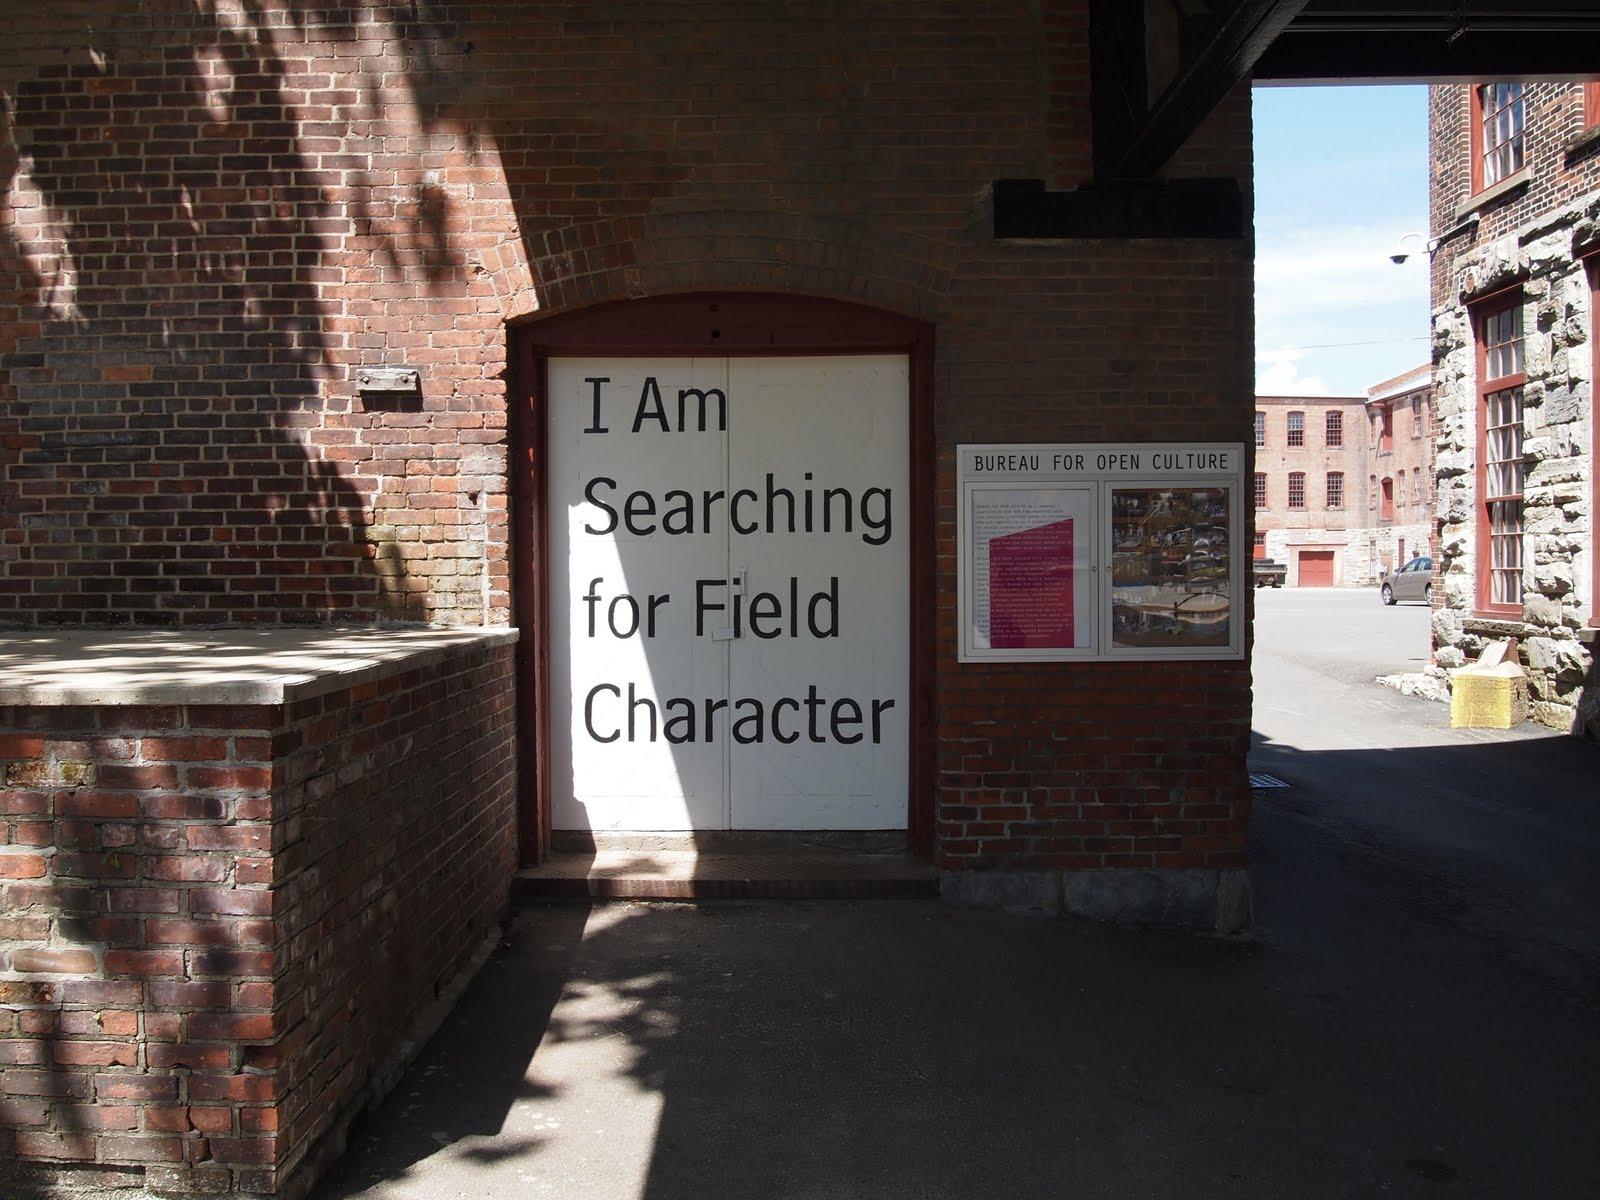 i-am-searching-for-field-character-mass-moca-north-adams-ma_7404339520_o.jpg